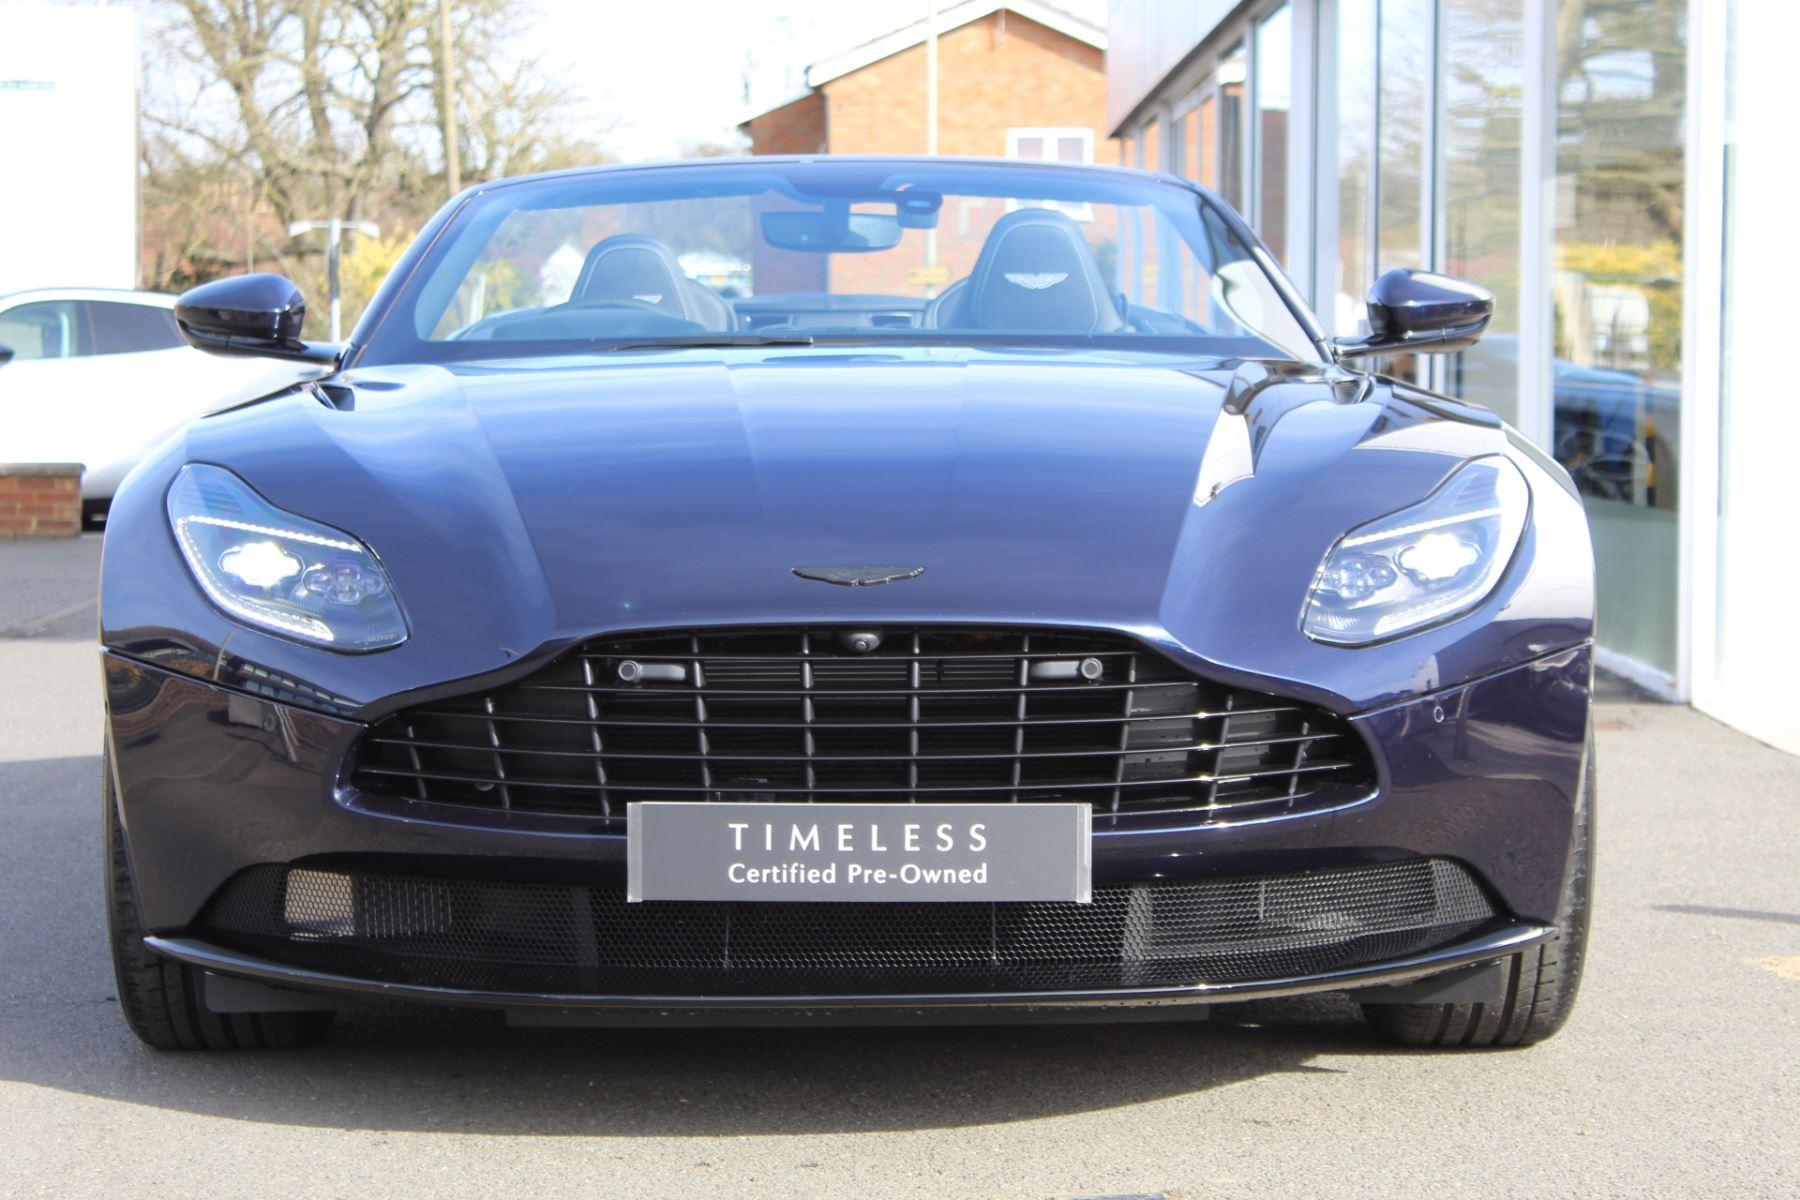 Aston Martin DB11 Volante V8 Volante 2dr Touchtronic image 4